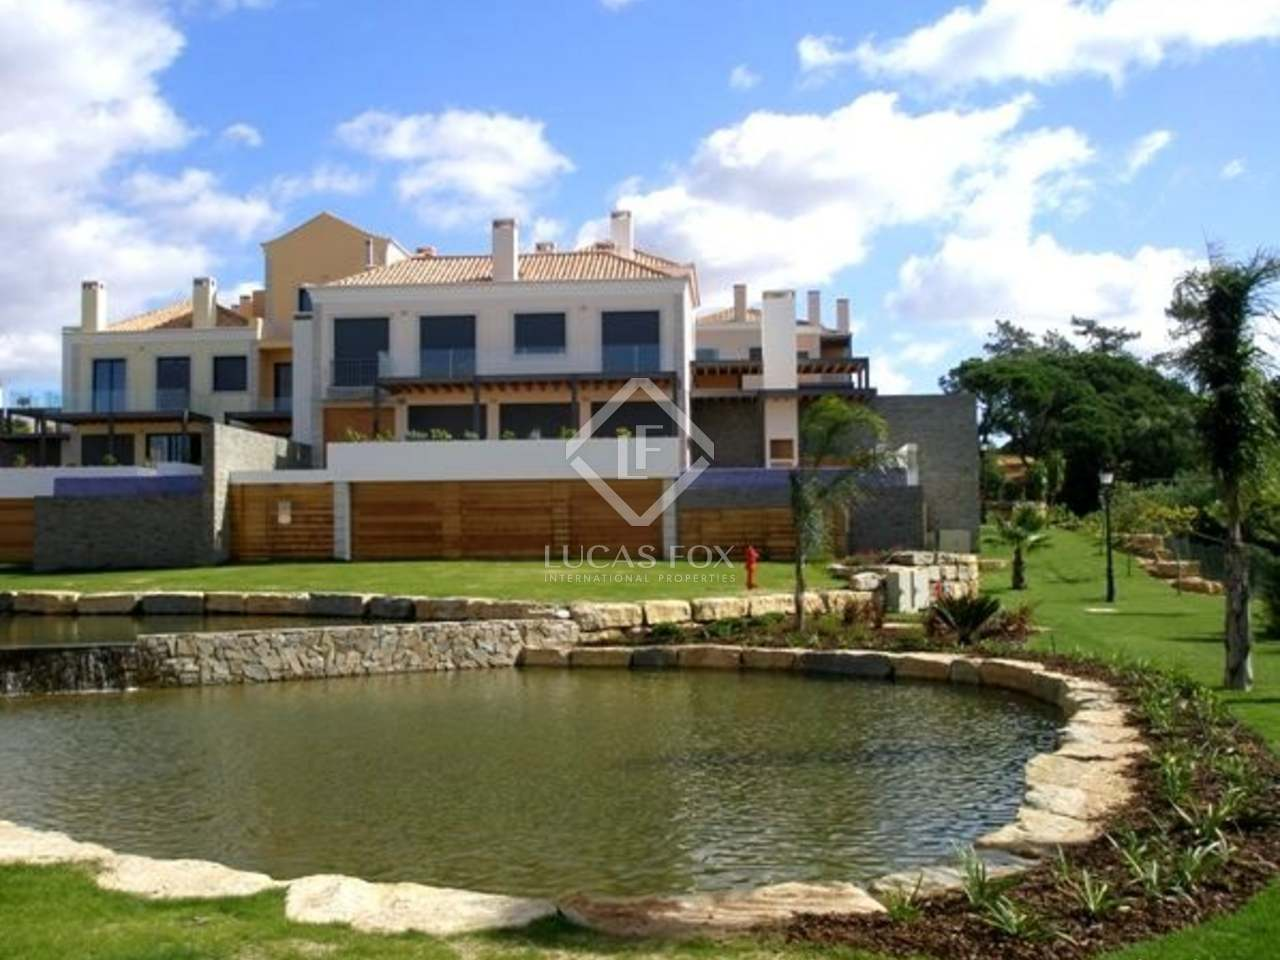 247m haus villa zum verkauf in algarve portugal. Black Bedroom Furniture Sets. Home Design Ideas